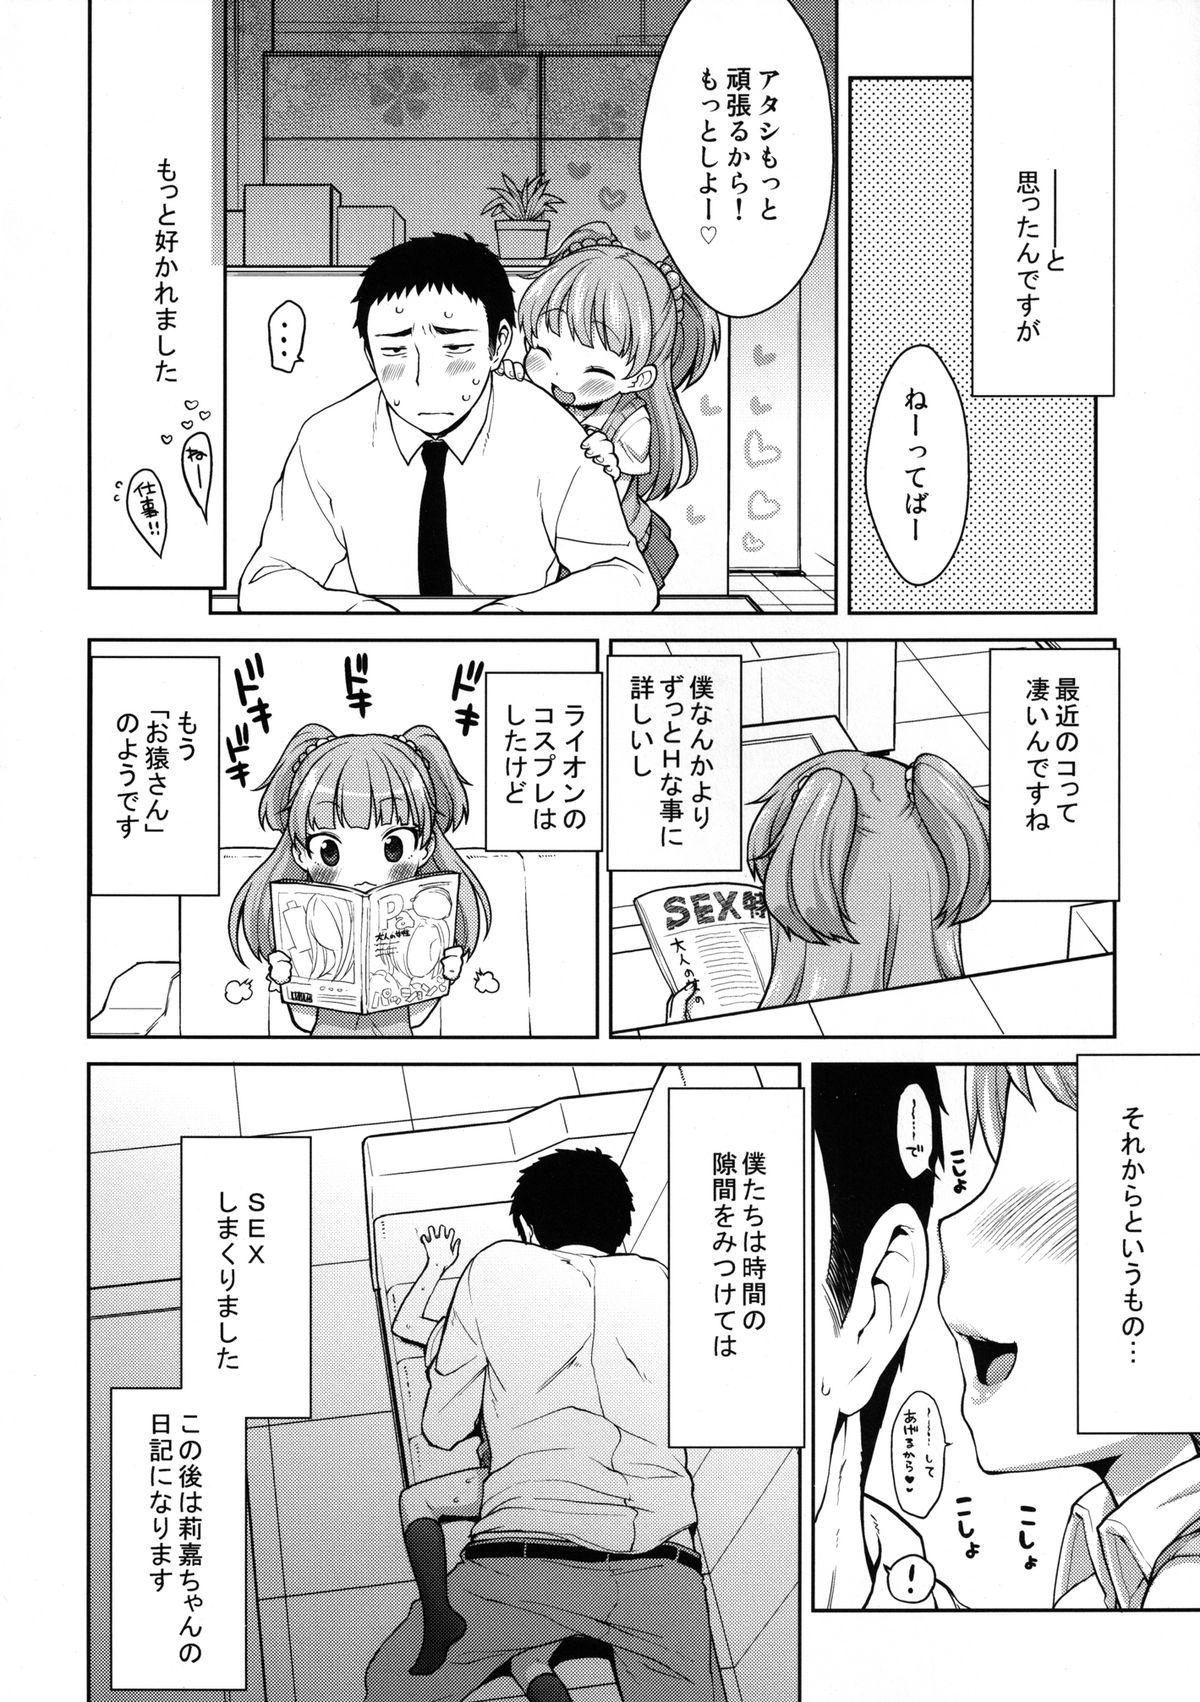 Rika-chan Kawaii 2